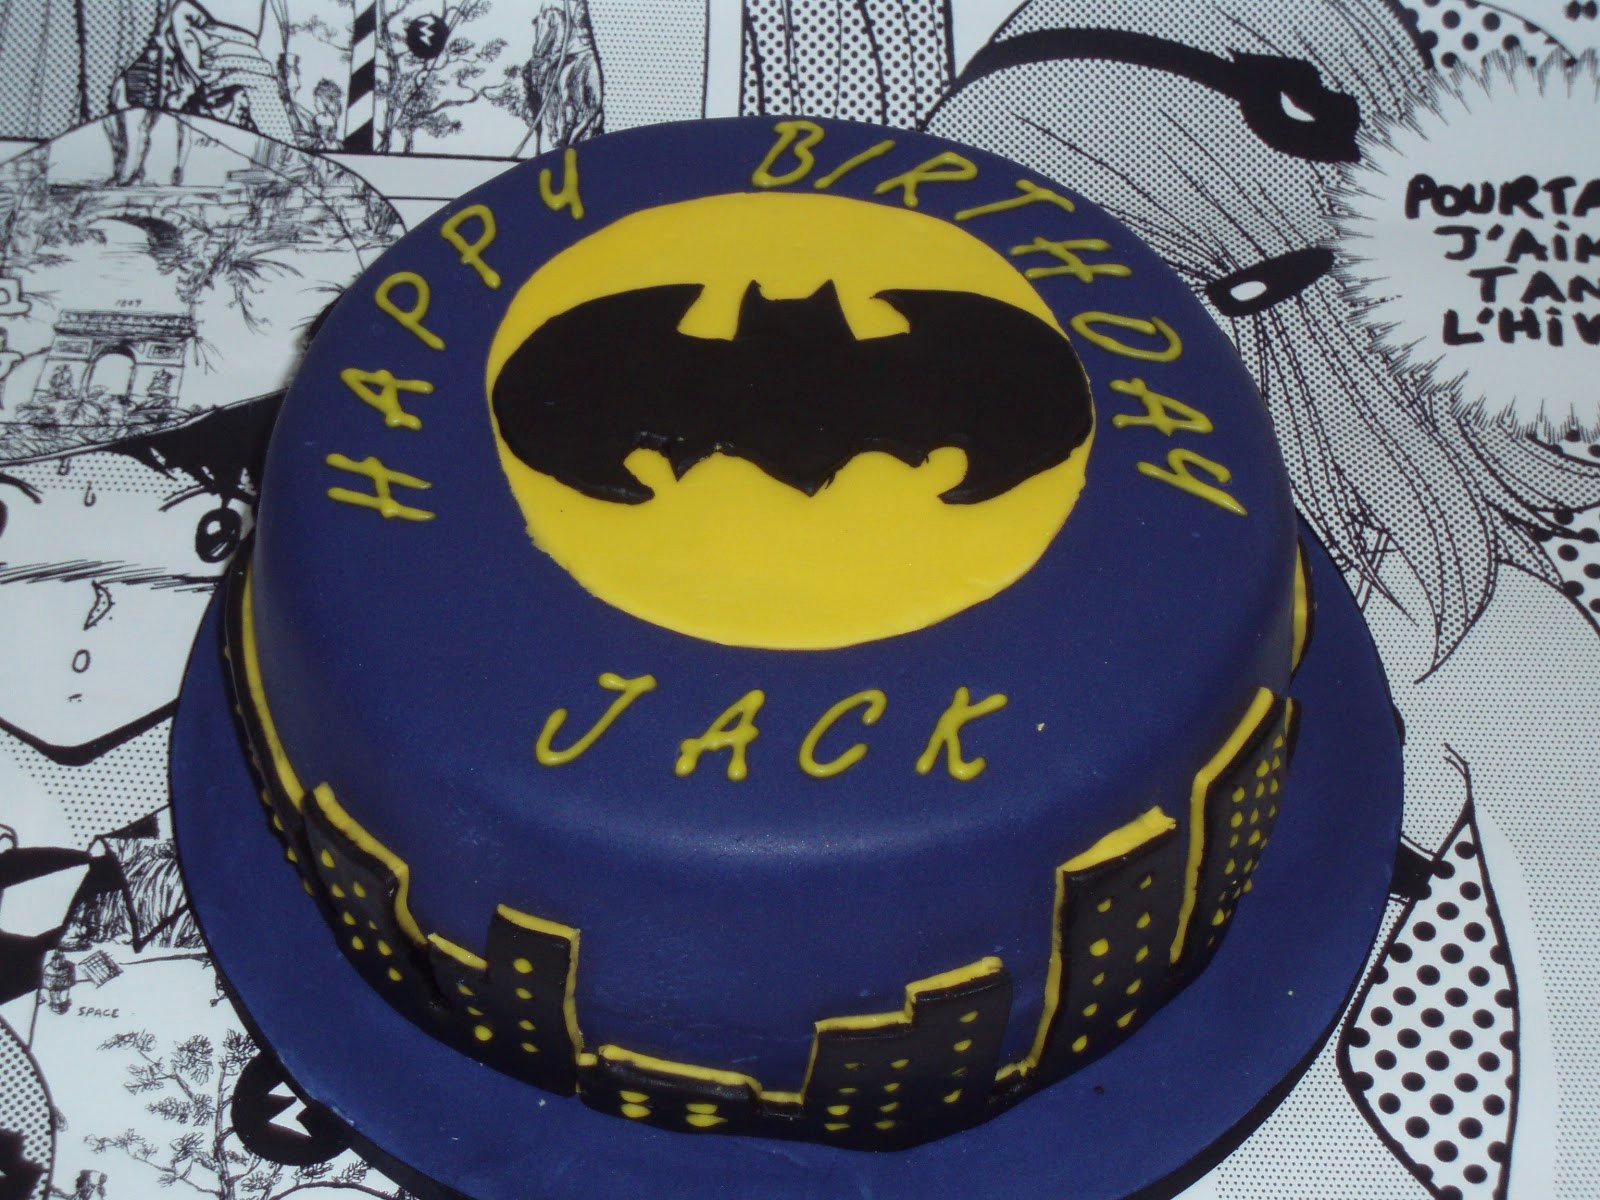 Batman Cake Template Fresh Batman Cake Template Cake Ideas and Designs